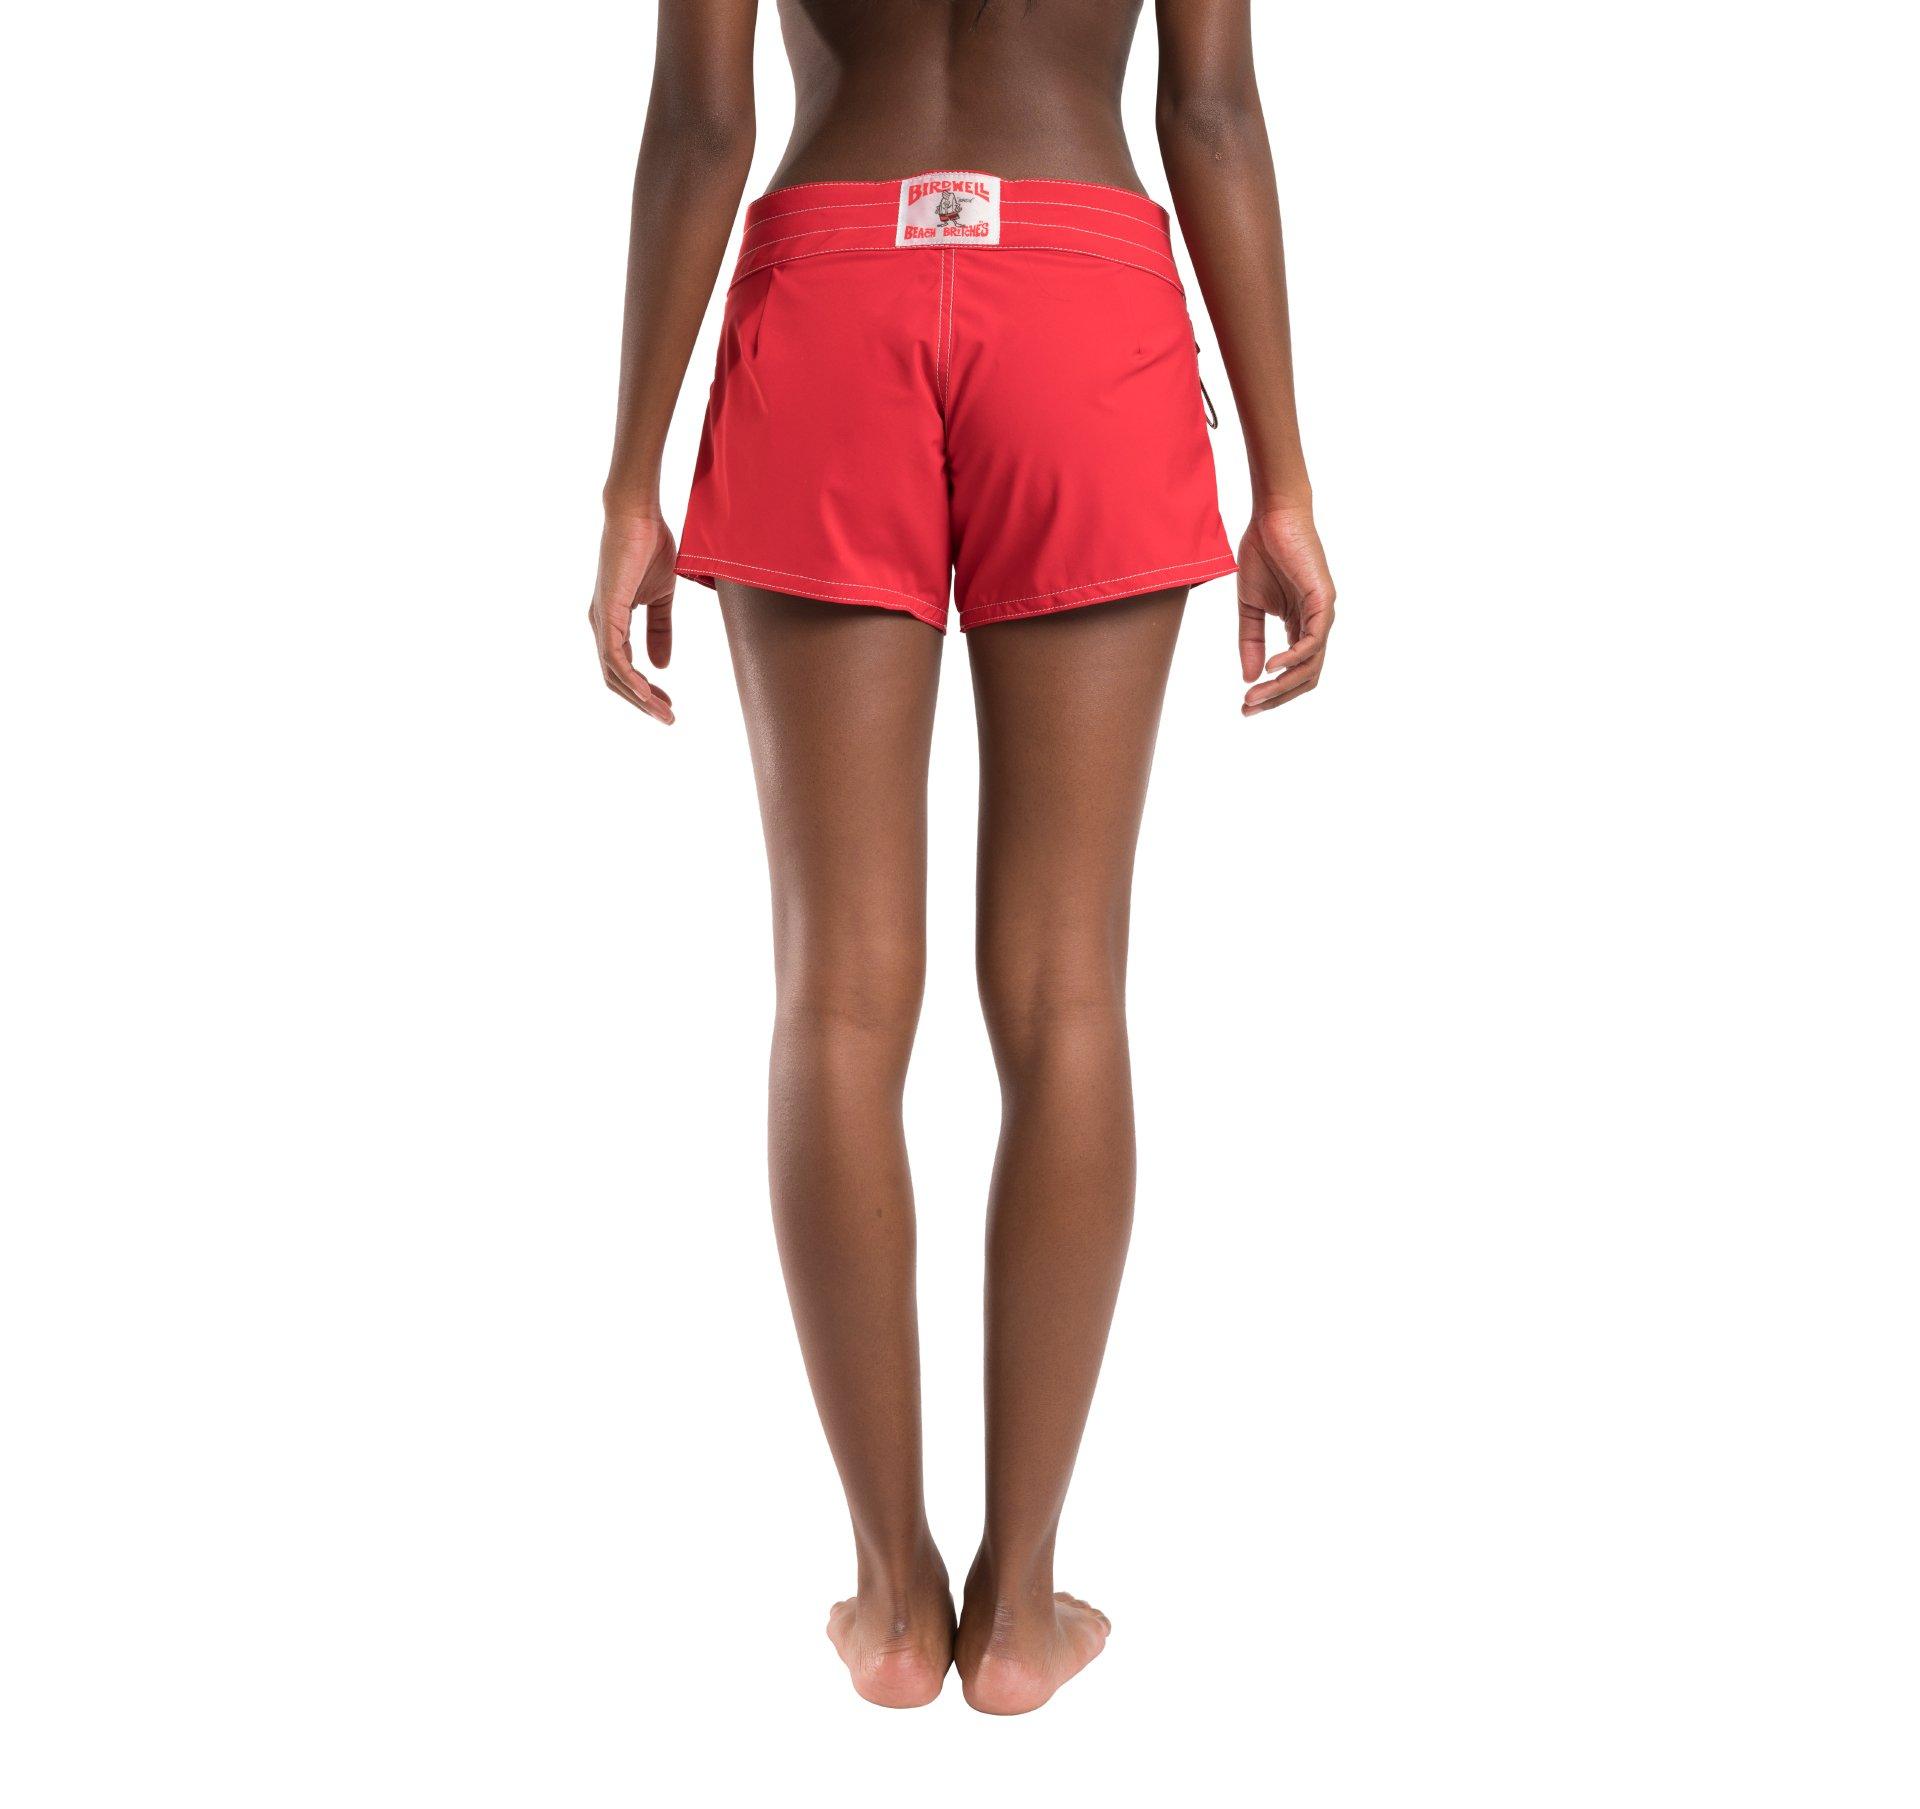 Birdwell Women's Stretch Board Shorts - Regular Rise (Red, 2) by Birdwell Beach Britches (Image #8)